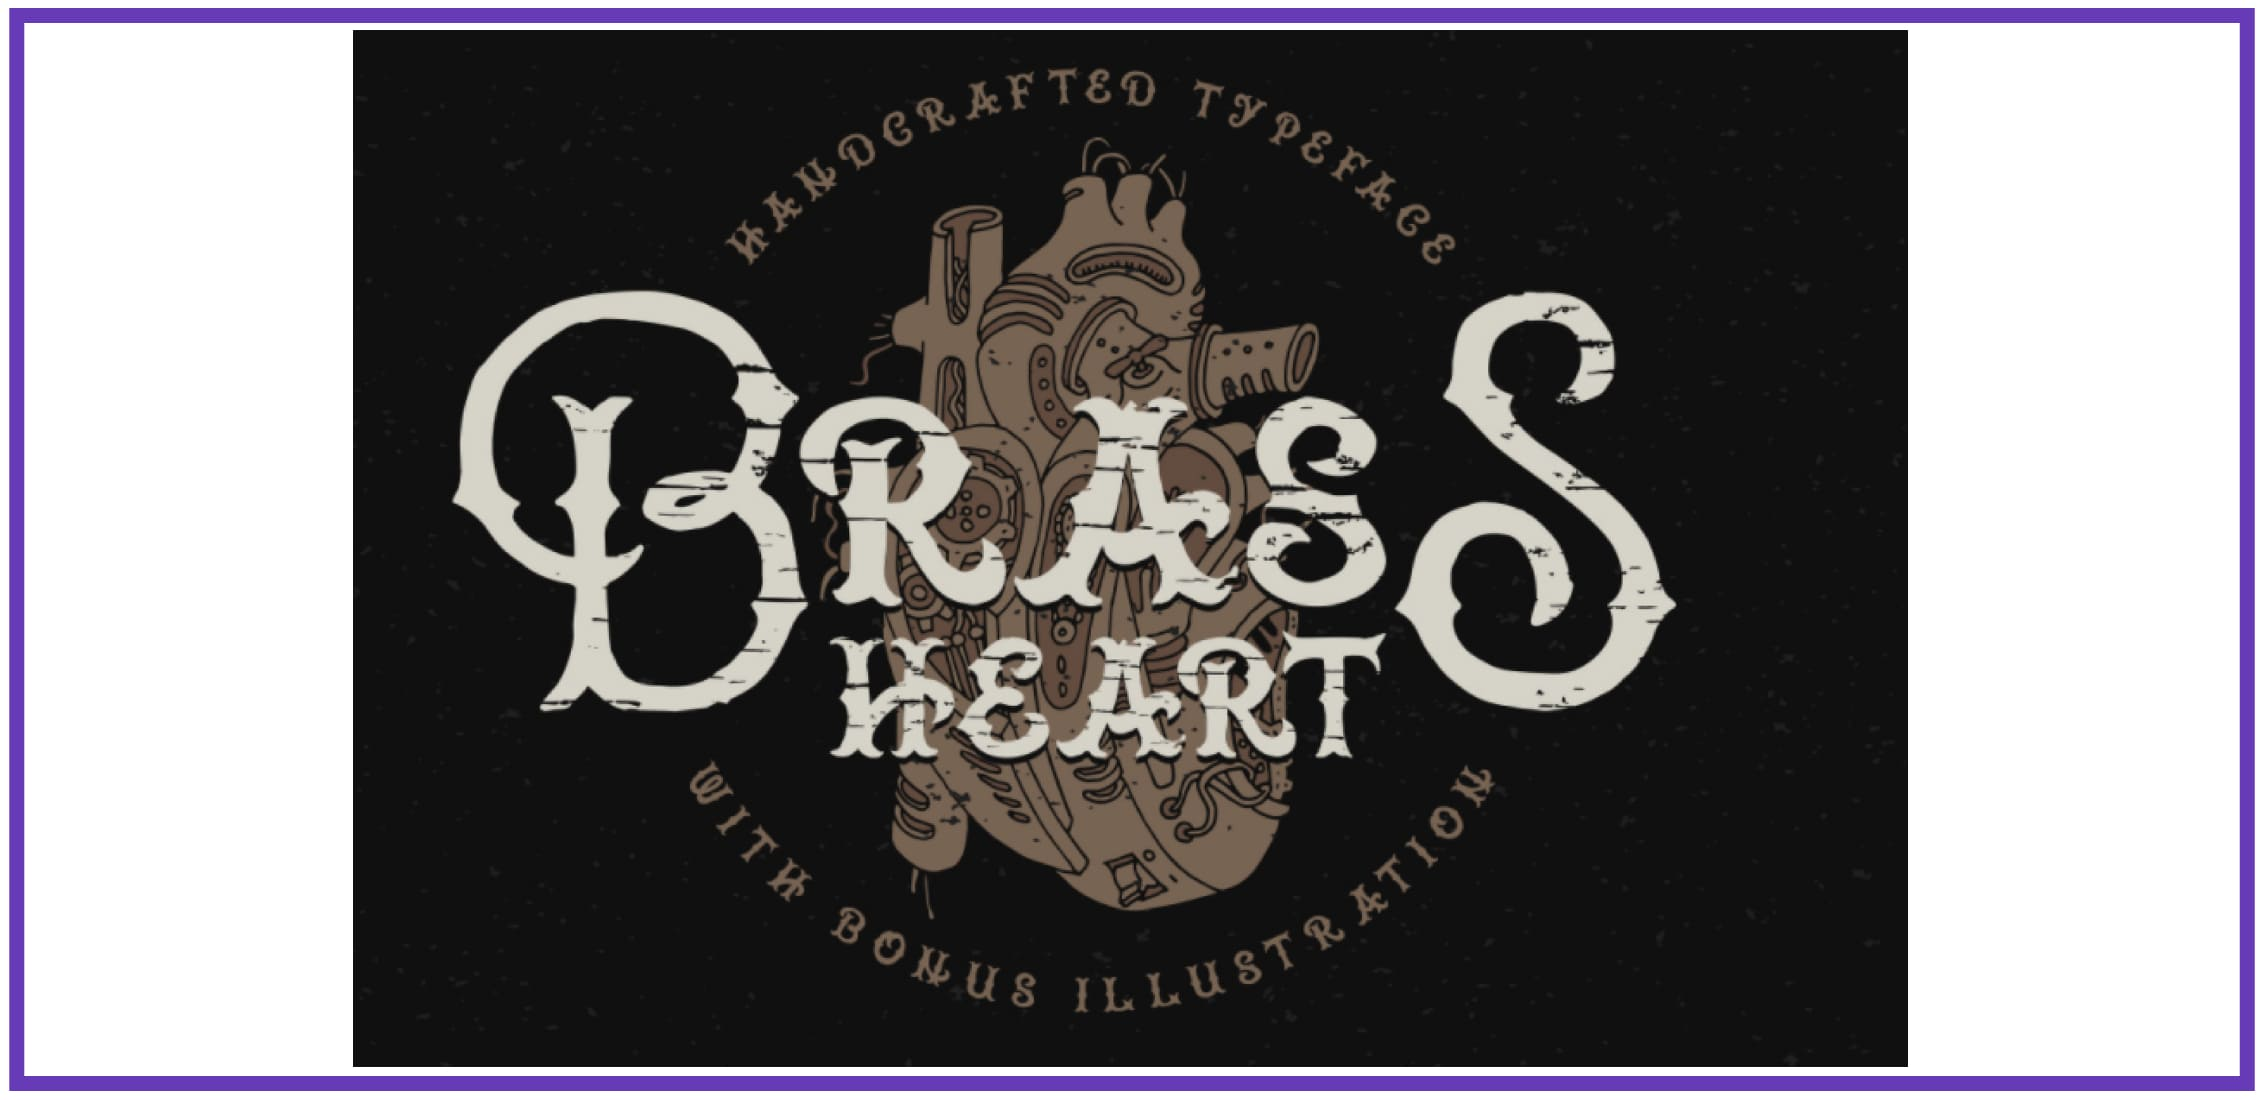 Vintage-inspired Brass Heart. Punk Font.